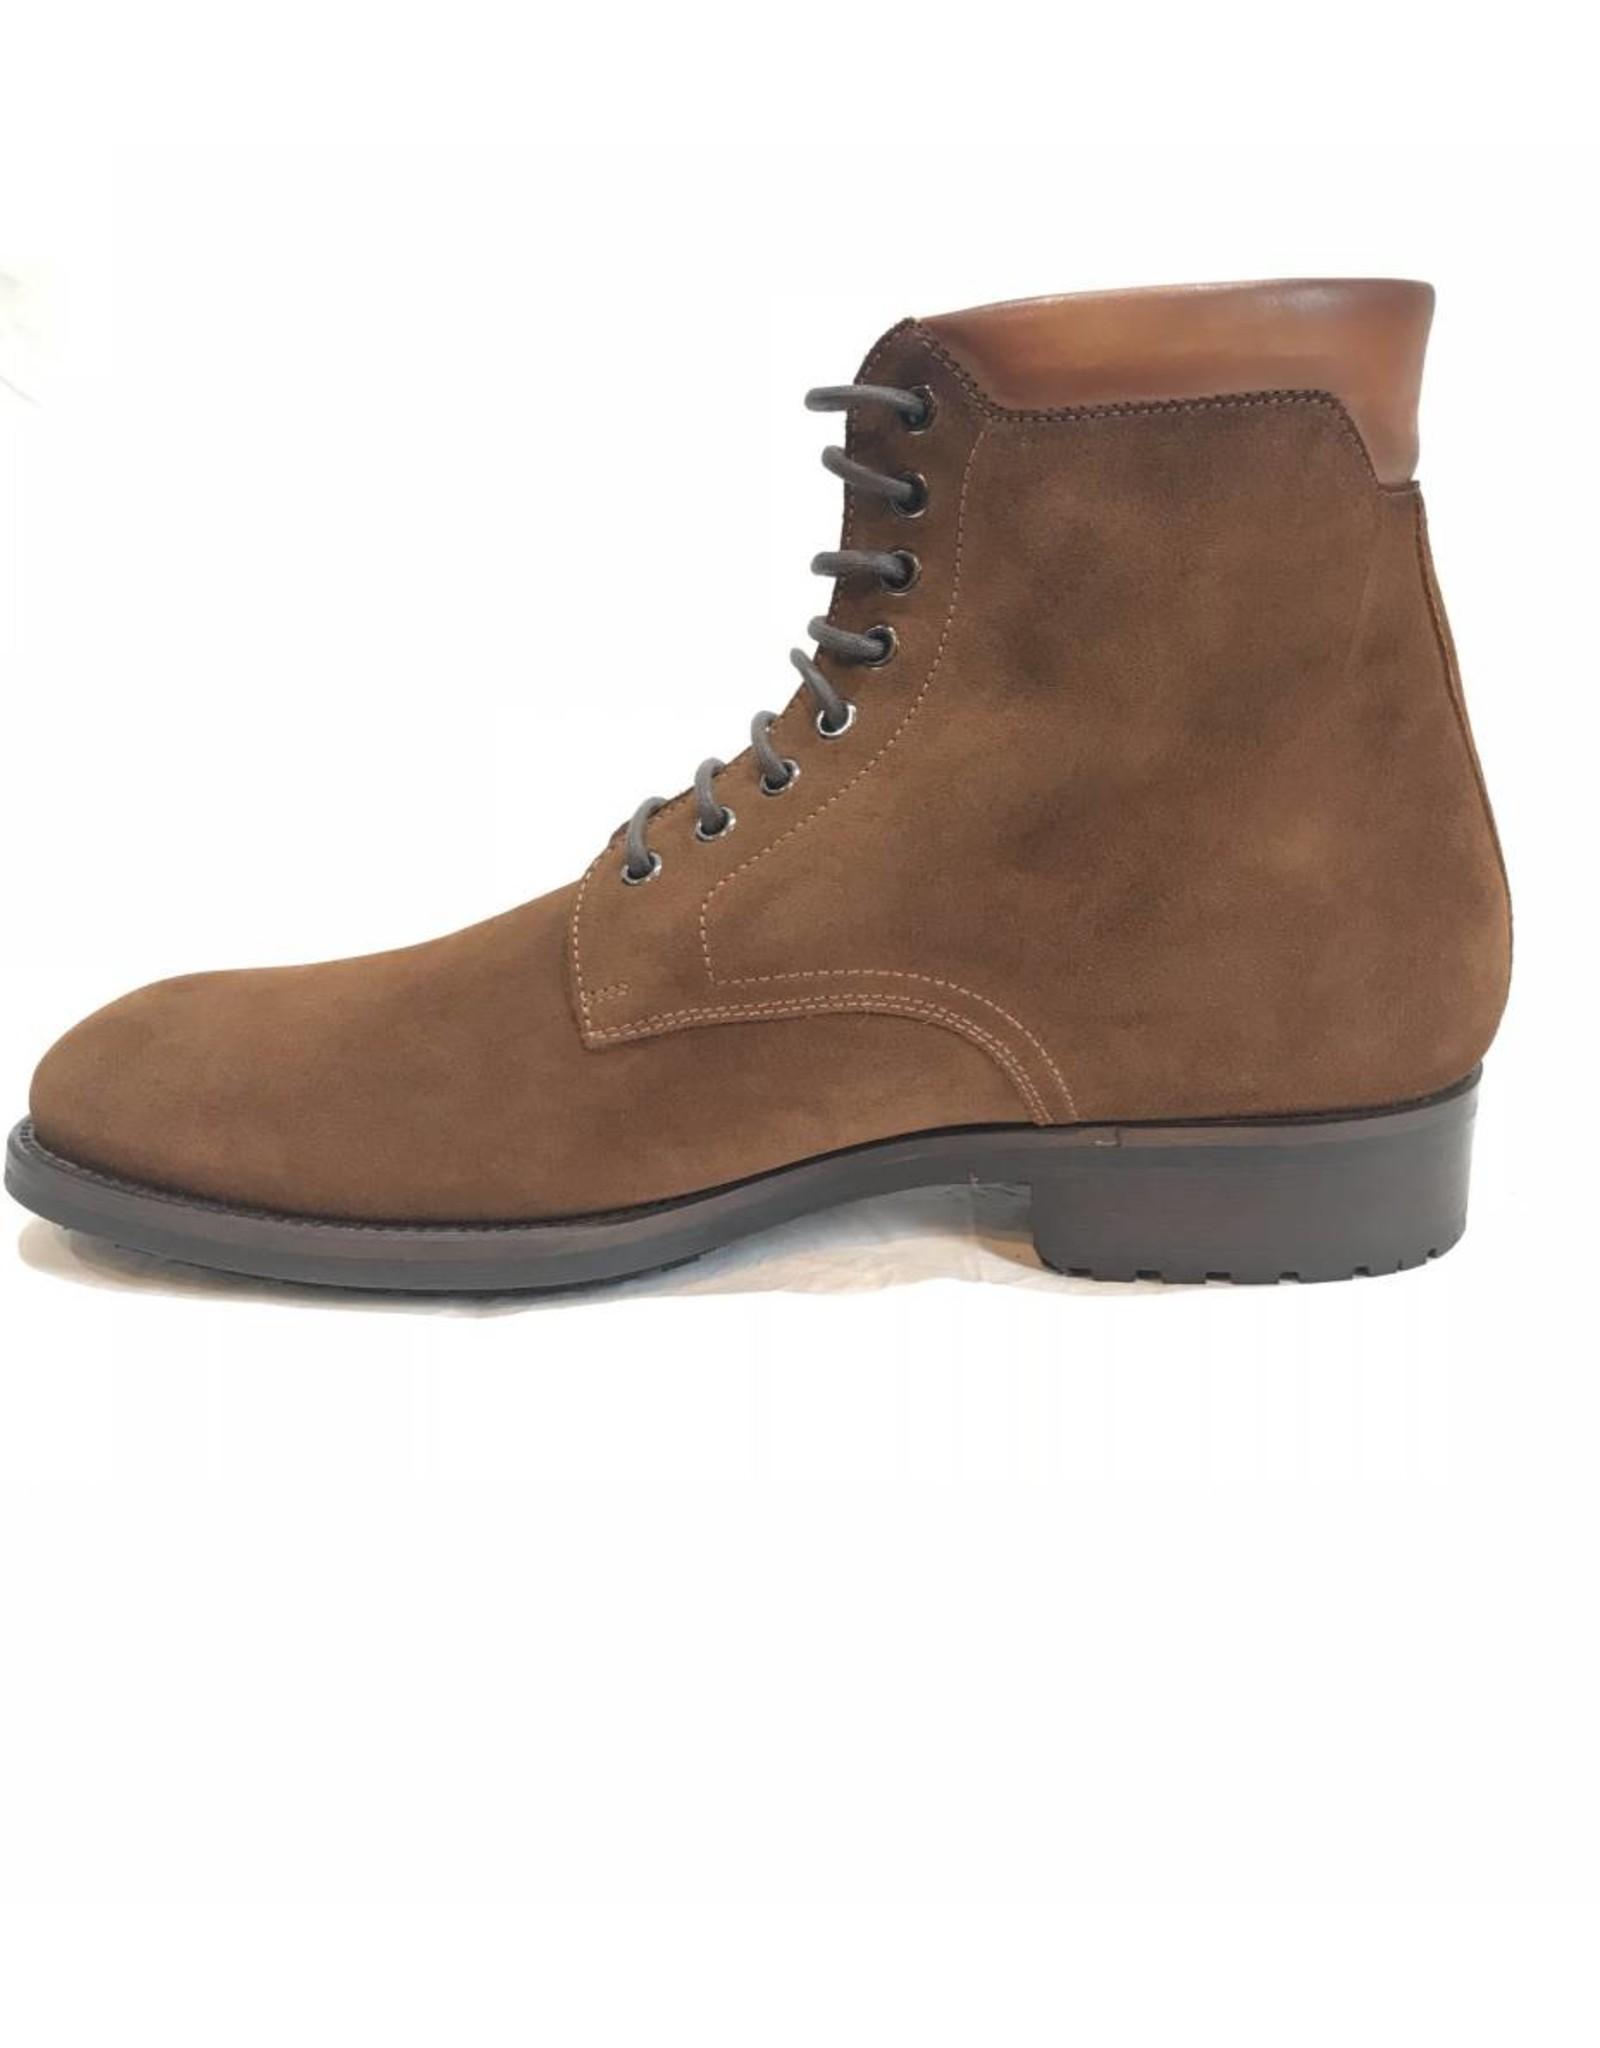 Magnanni Suede Boot